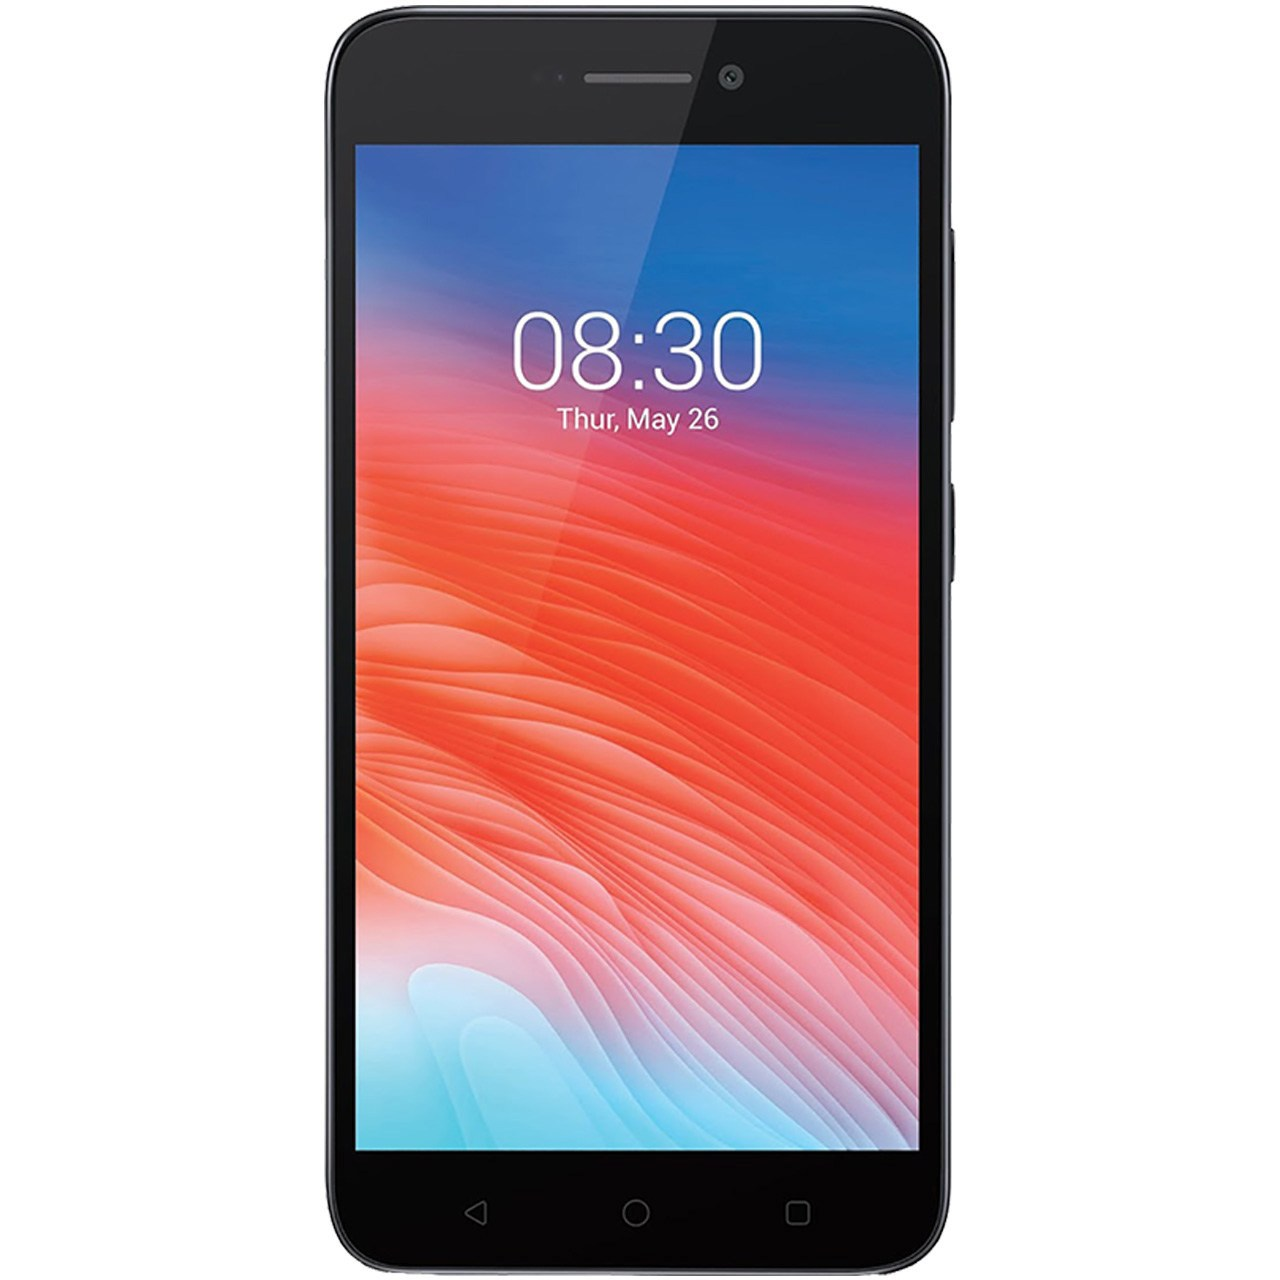 خرید                     گوشی موبایل تی پی-لینک مدل Neffos X1 Max TP903A دو سیم کارت